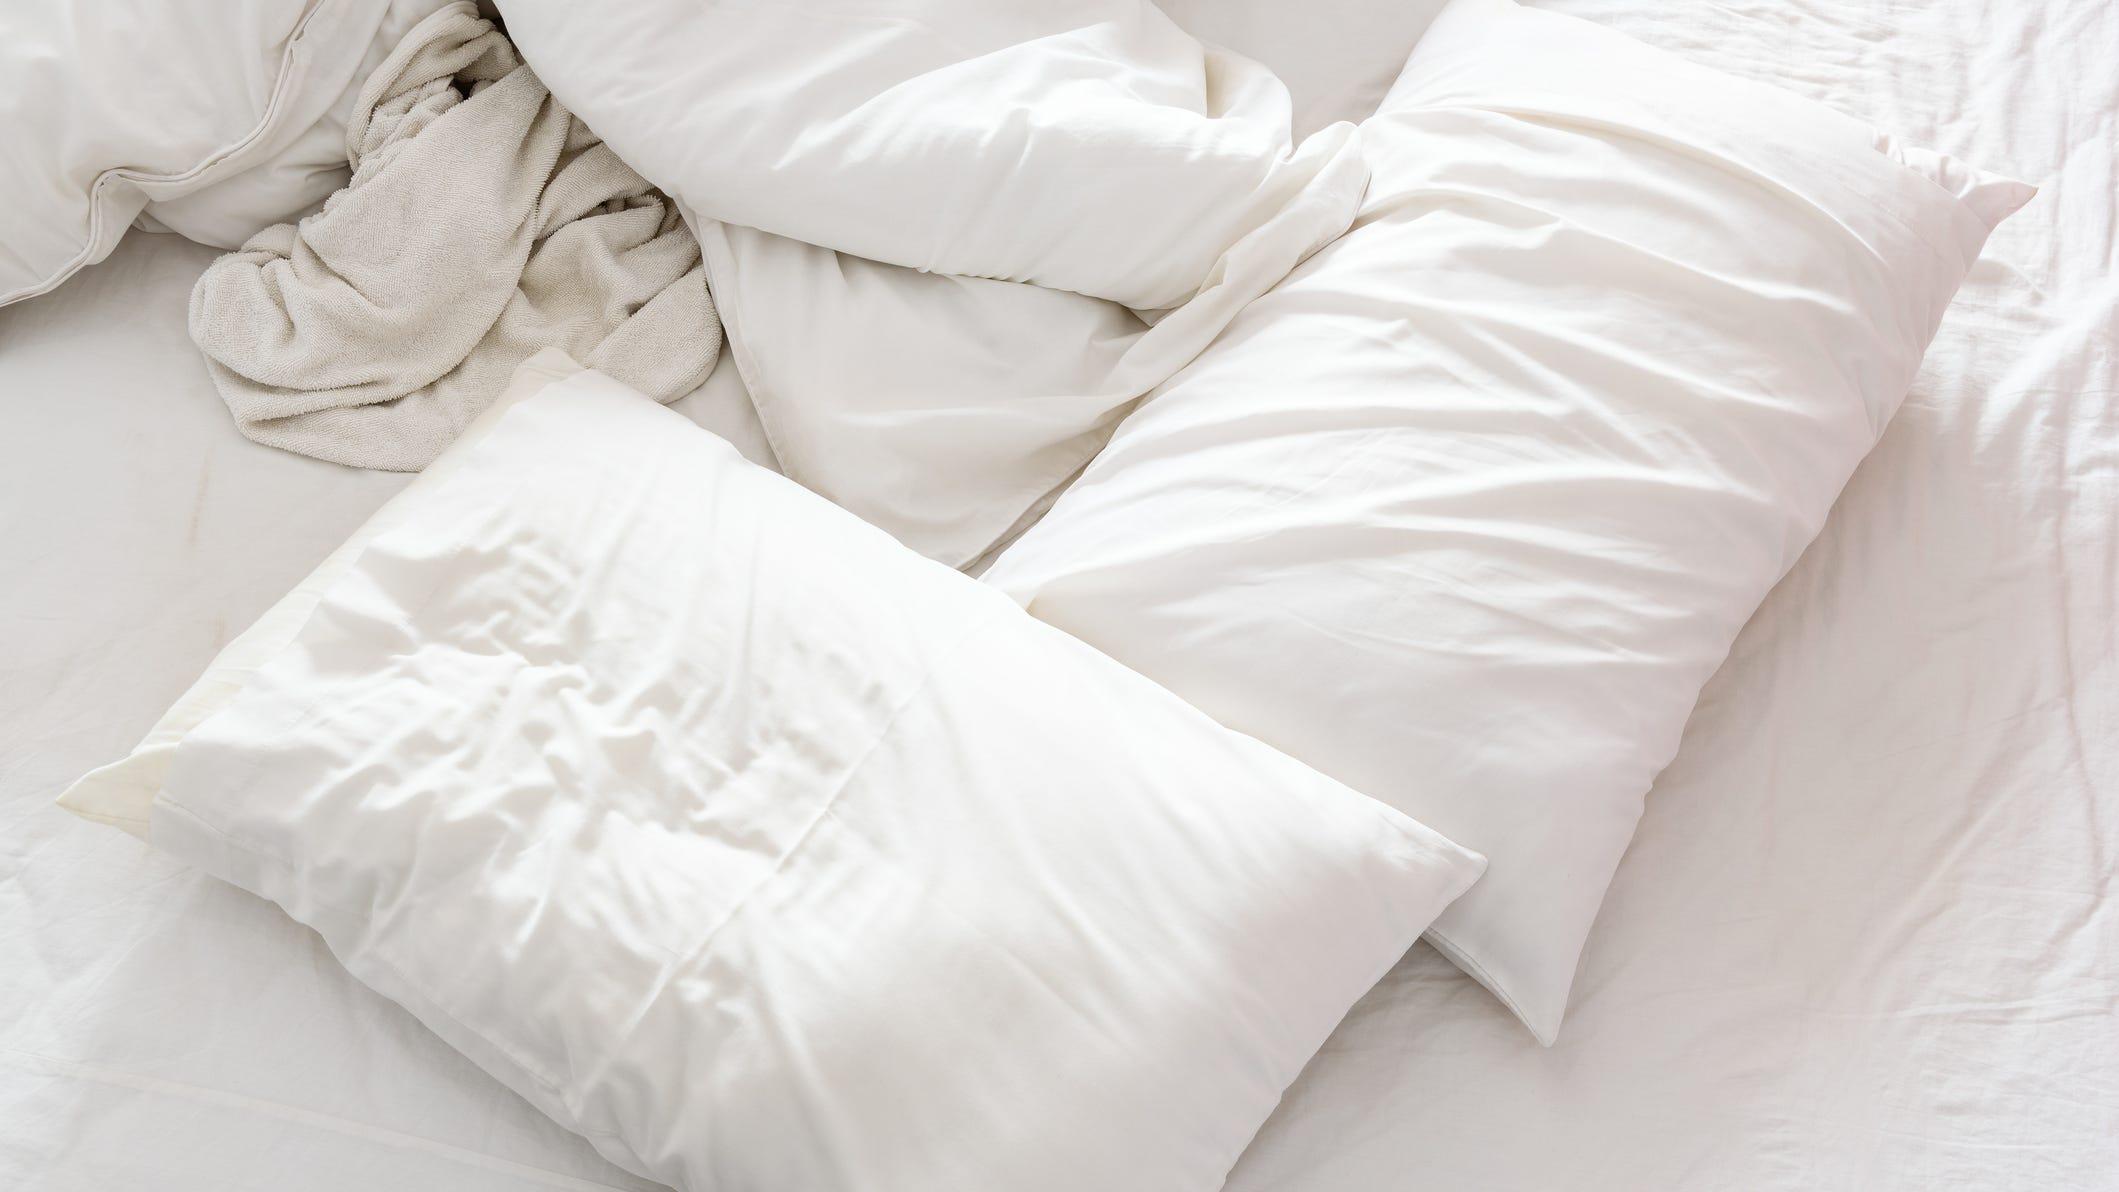 Pillow Washing Instructions